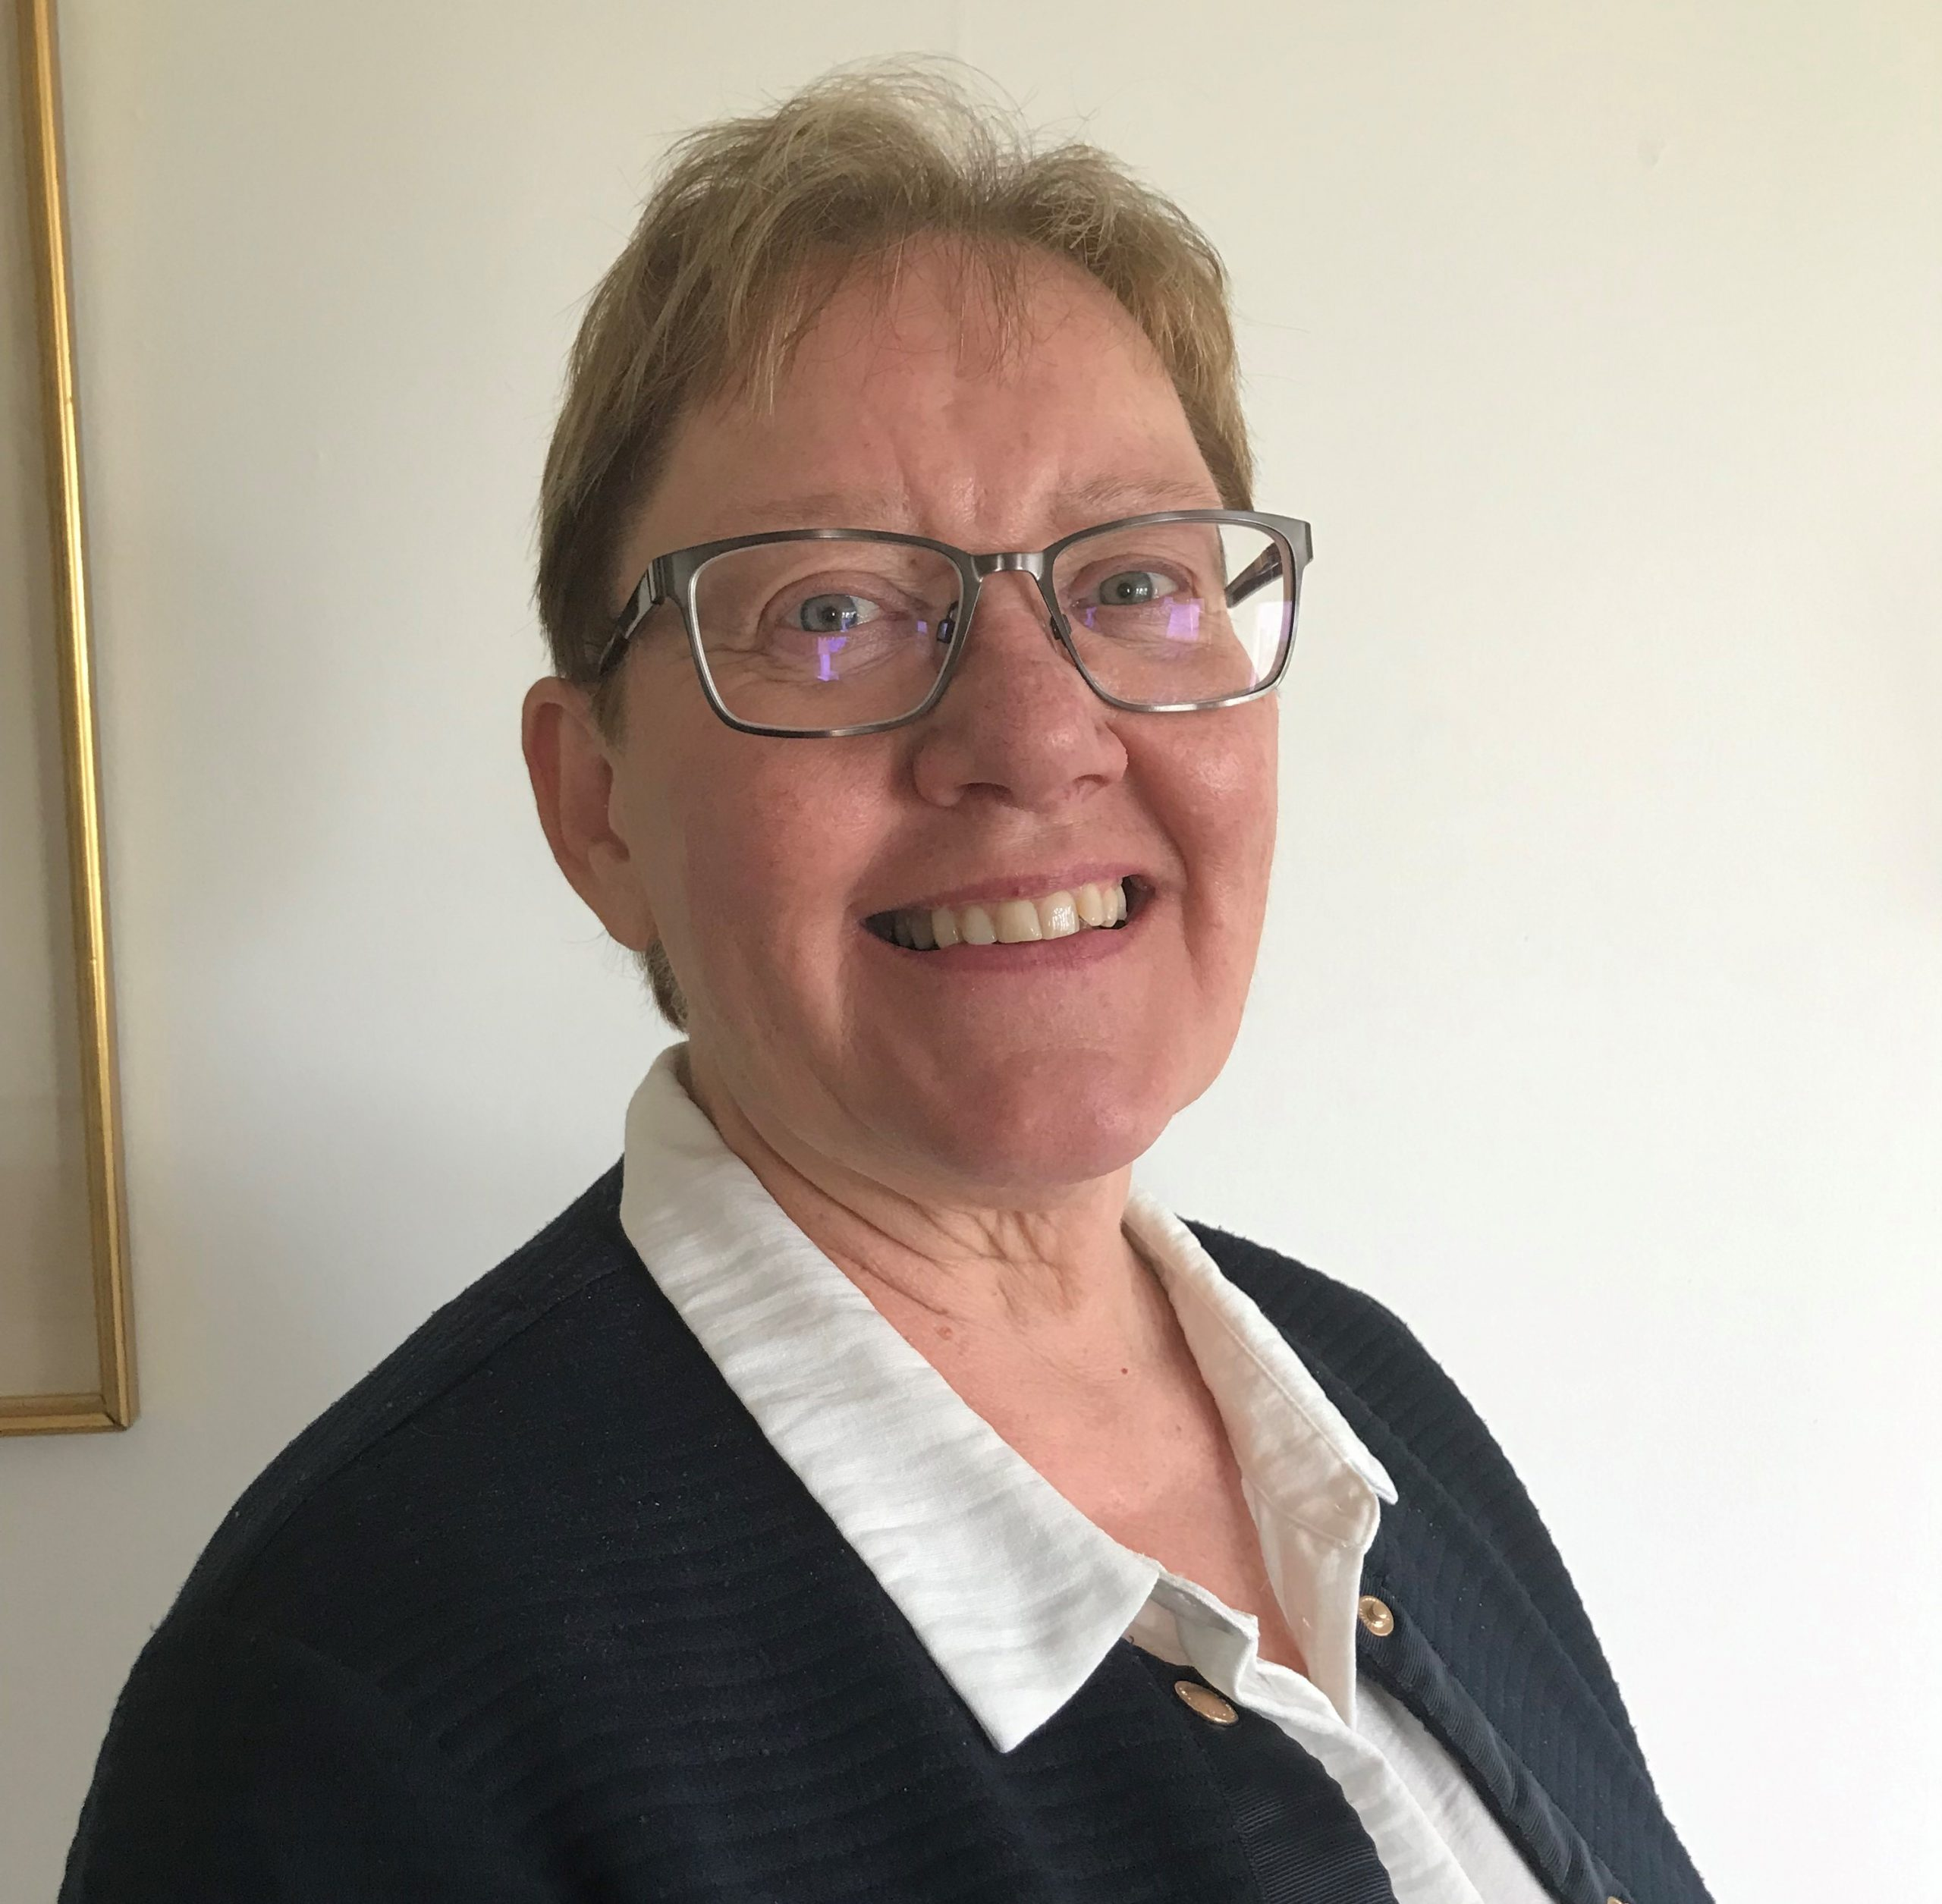 Ing-Marie Olofsdotter Nilsson